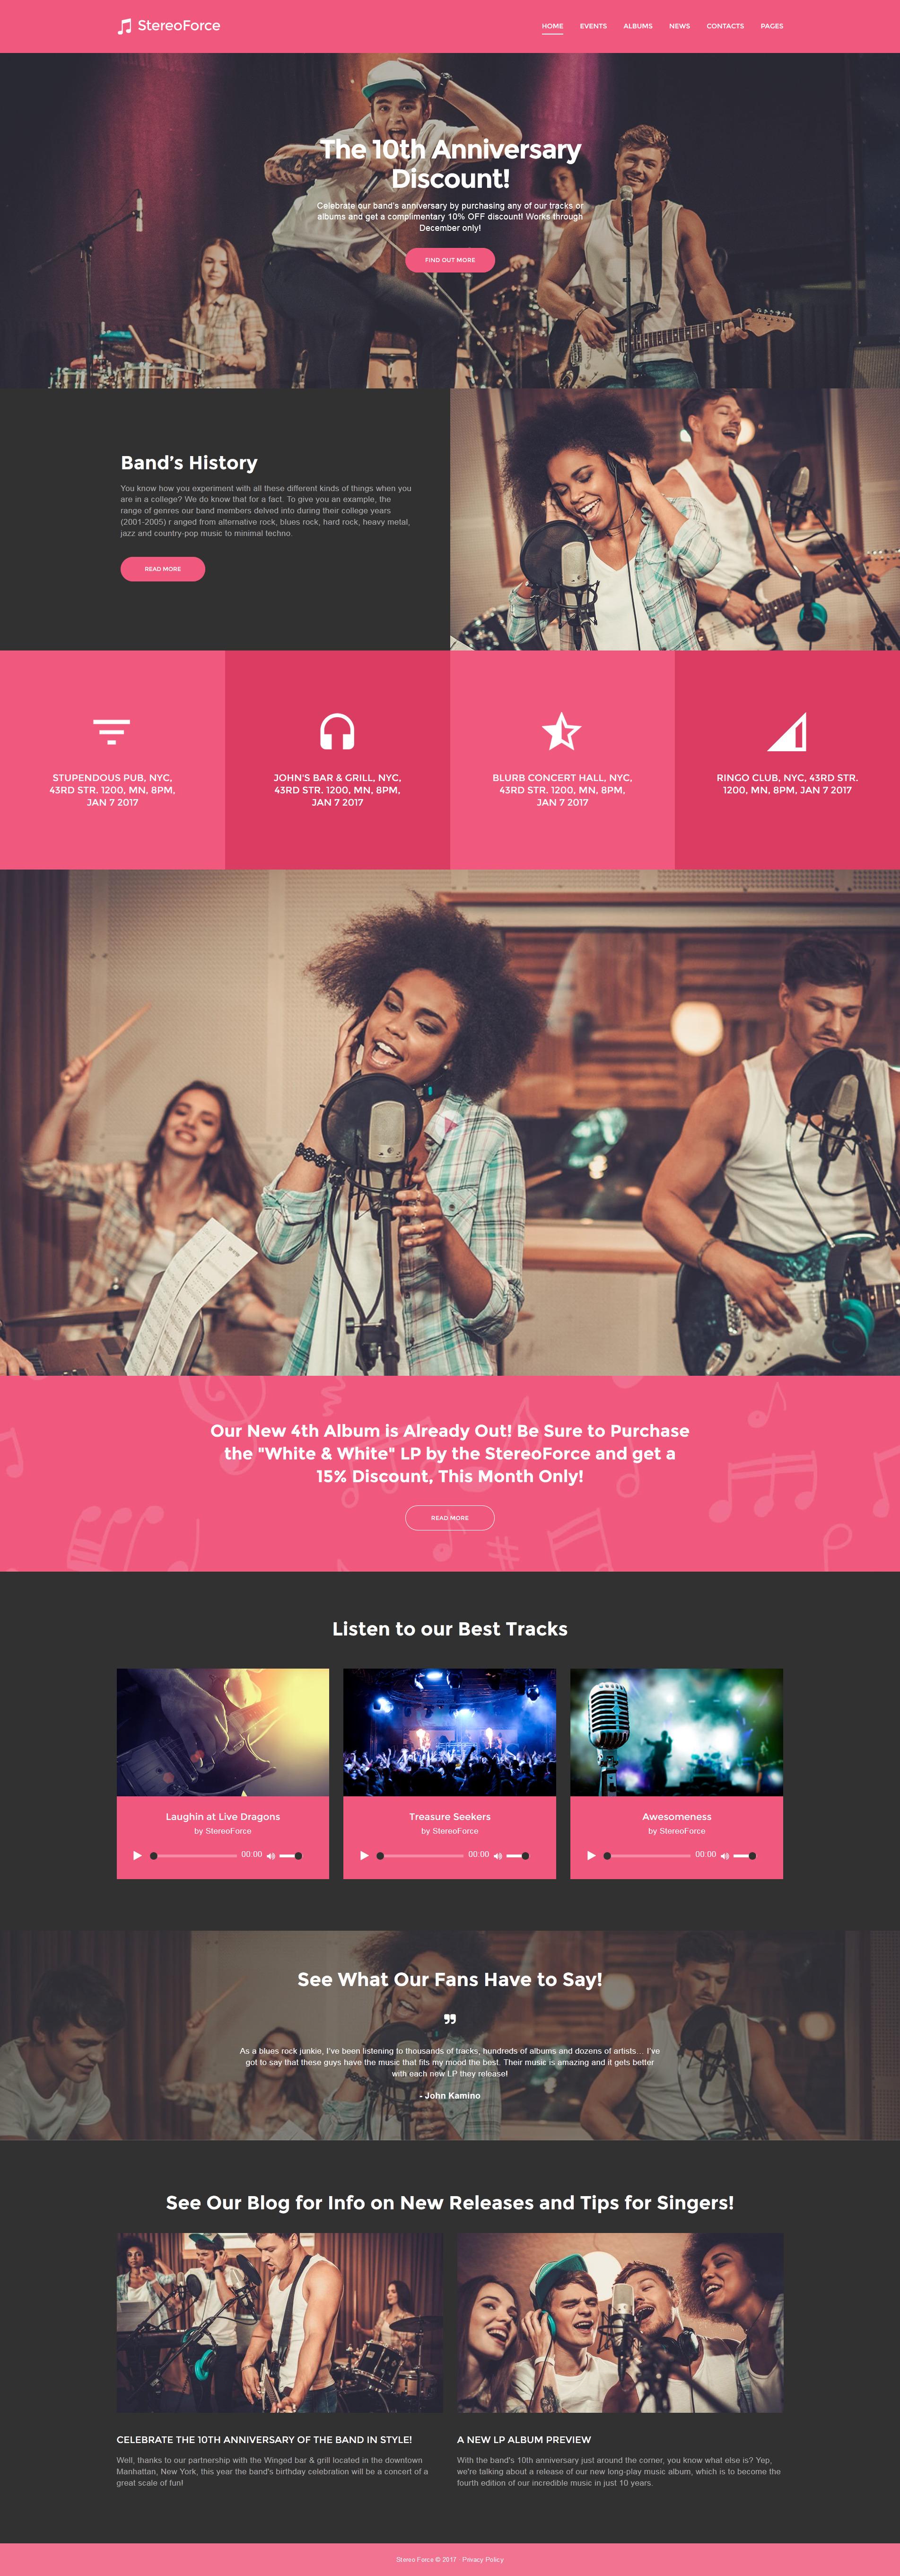 Thème WordPress adaptatif pour site musical #58988 - screenshot